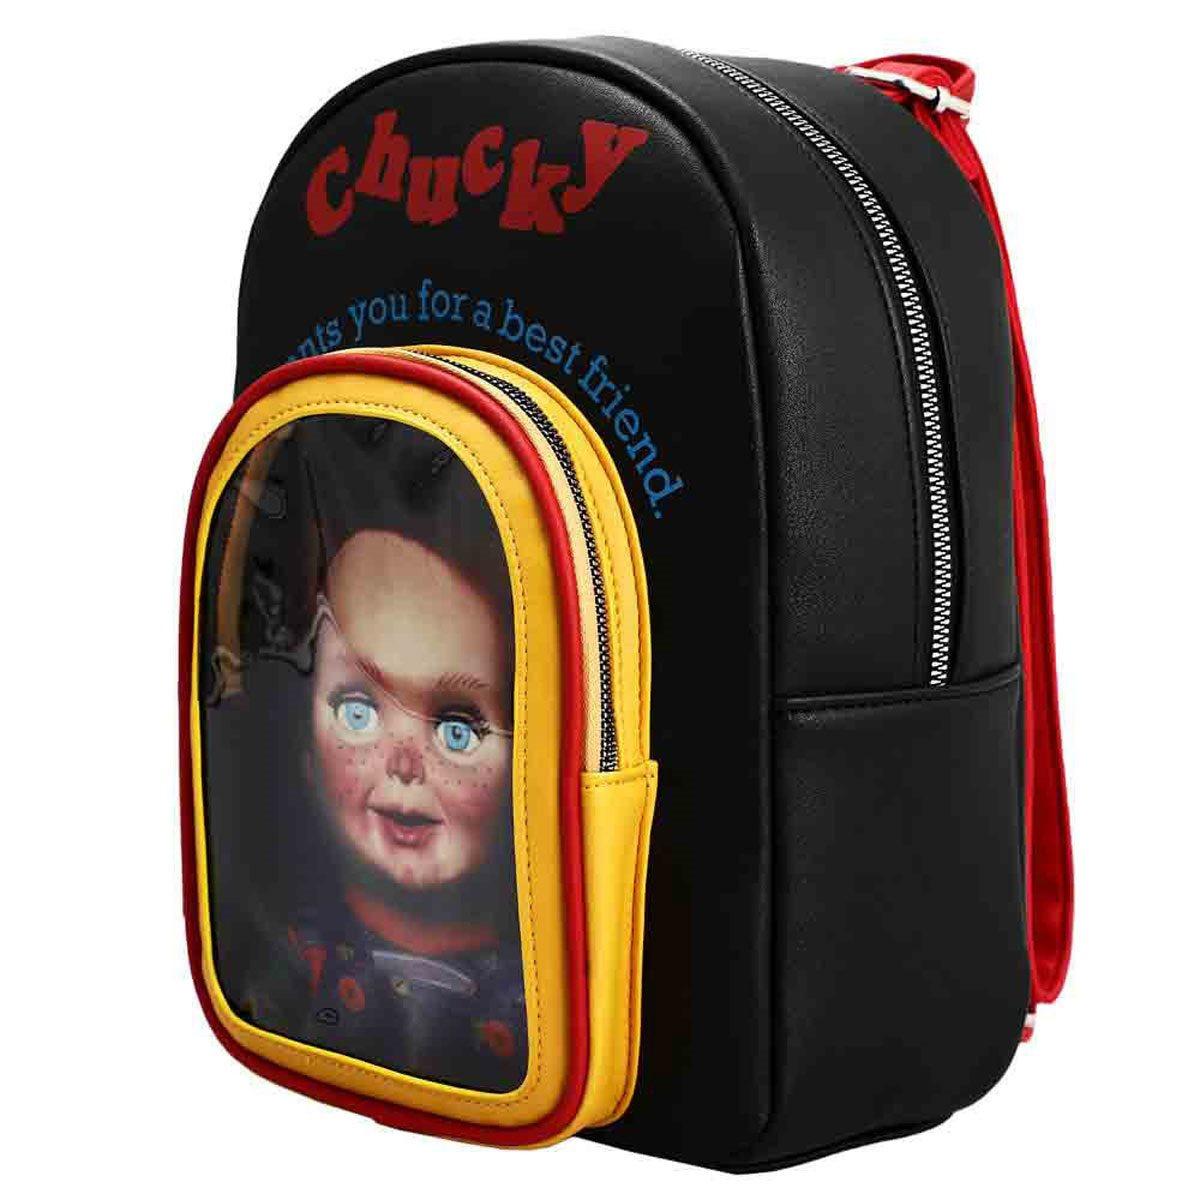 Child's Play Chuky Toy Box Mini-Backpack